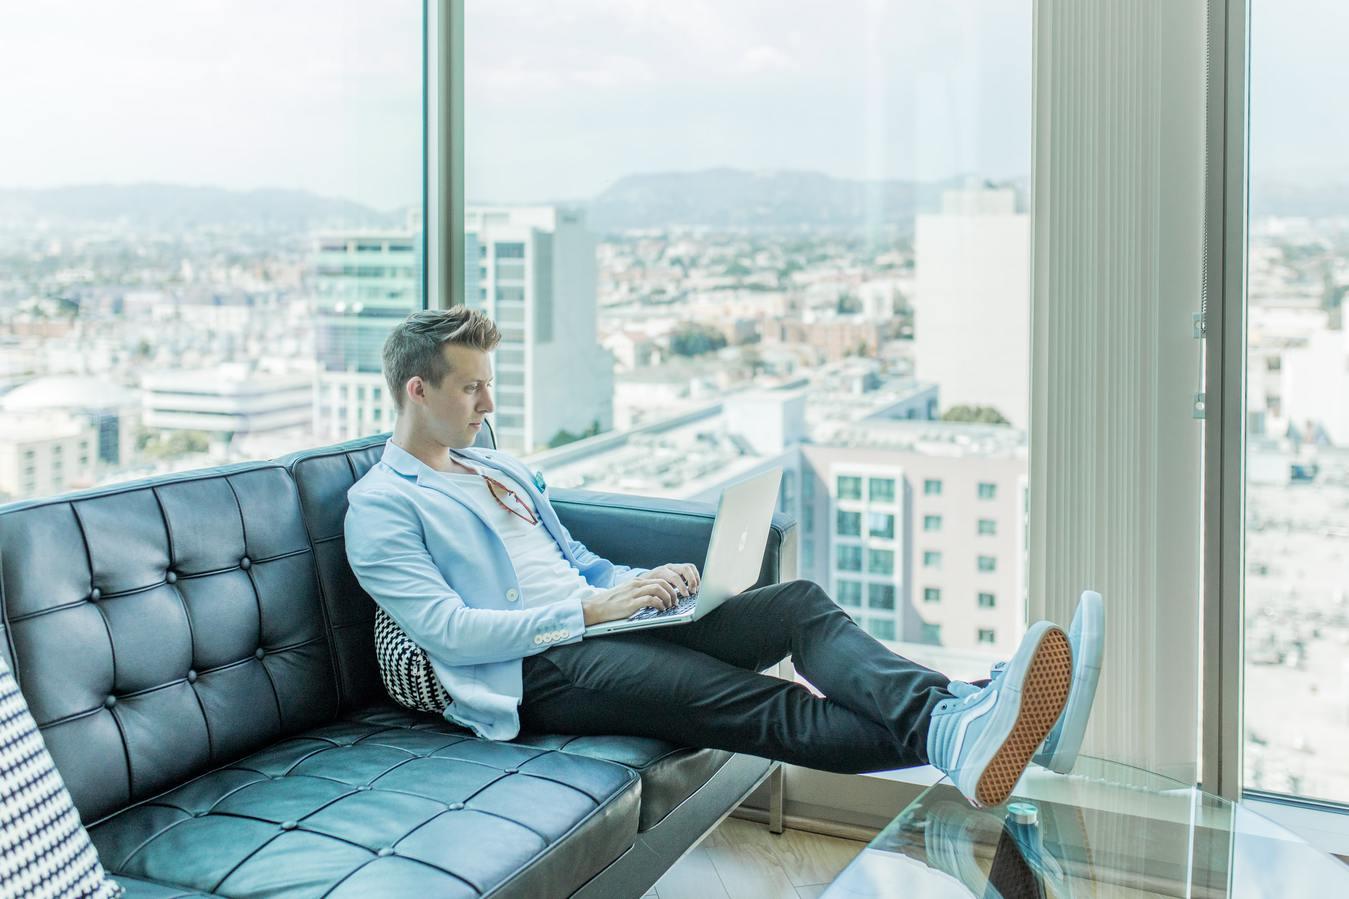 Человек, работающий на ноутбуке на диване с видом на город